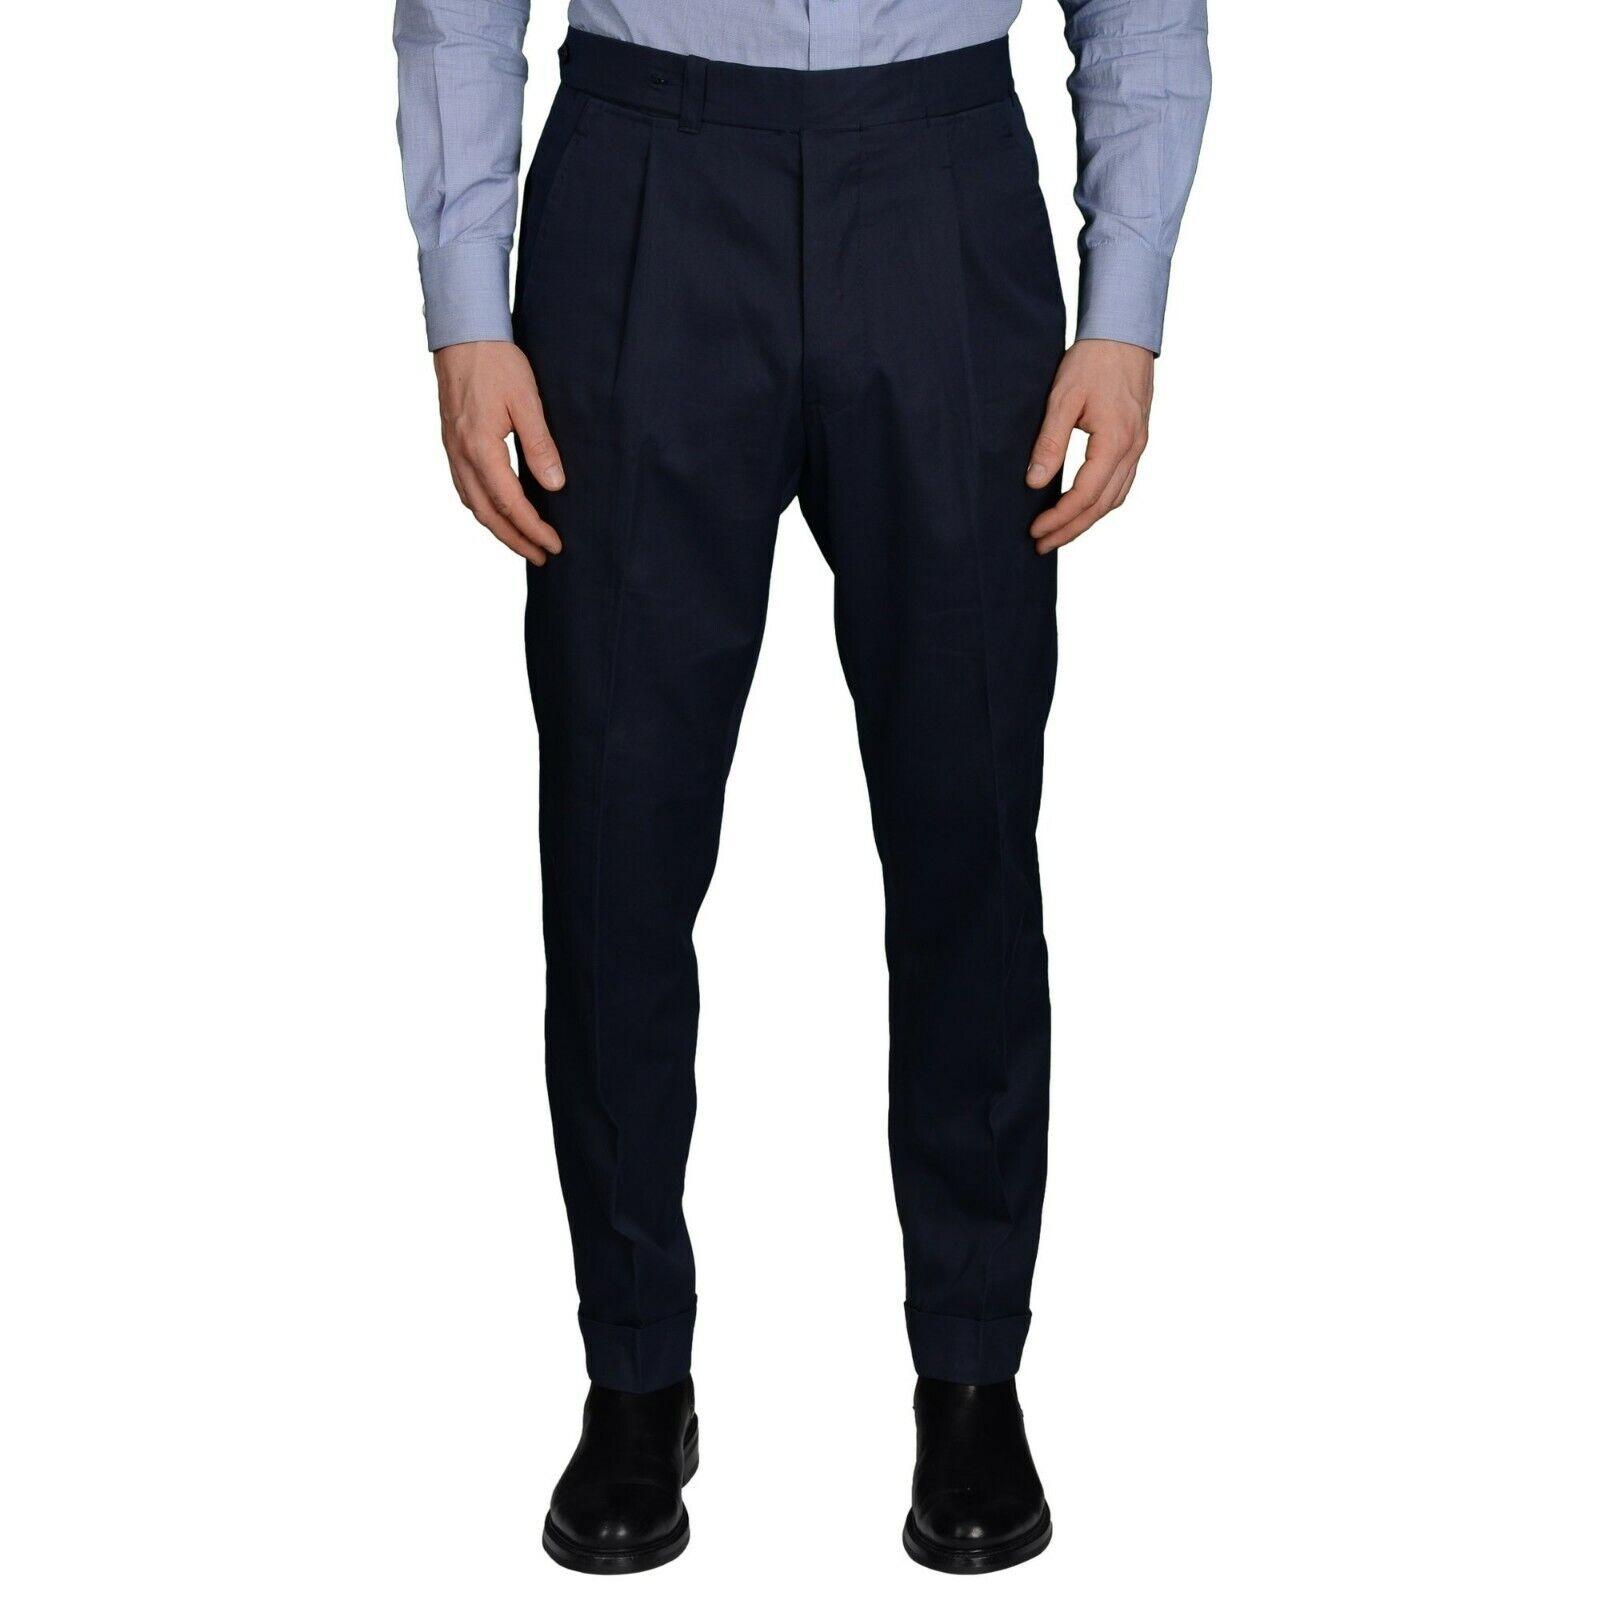 Alfani Classic Fit Solid Navy bluee Pleated 100% Wool Dress Pants 36x32